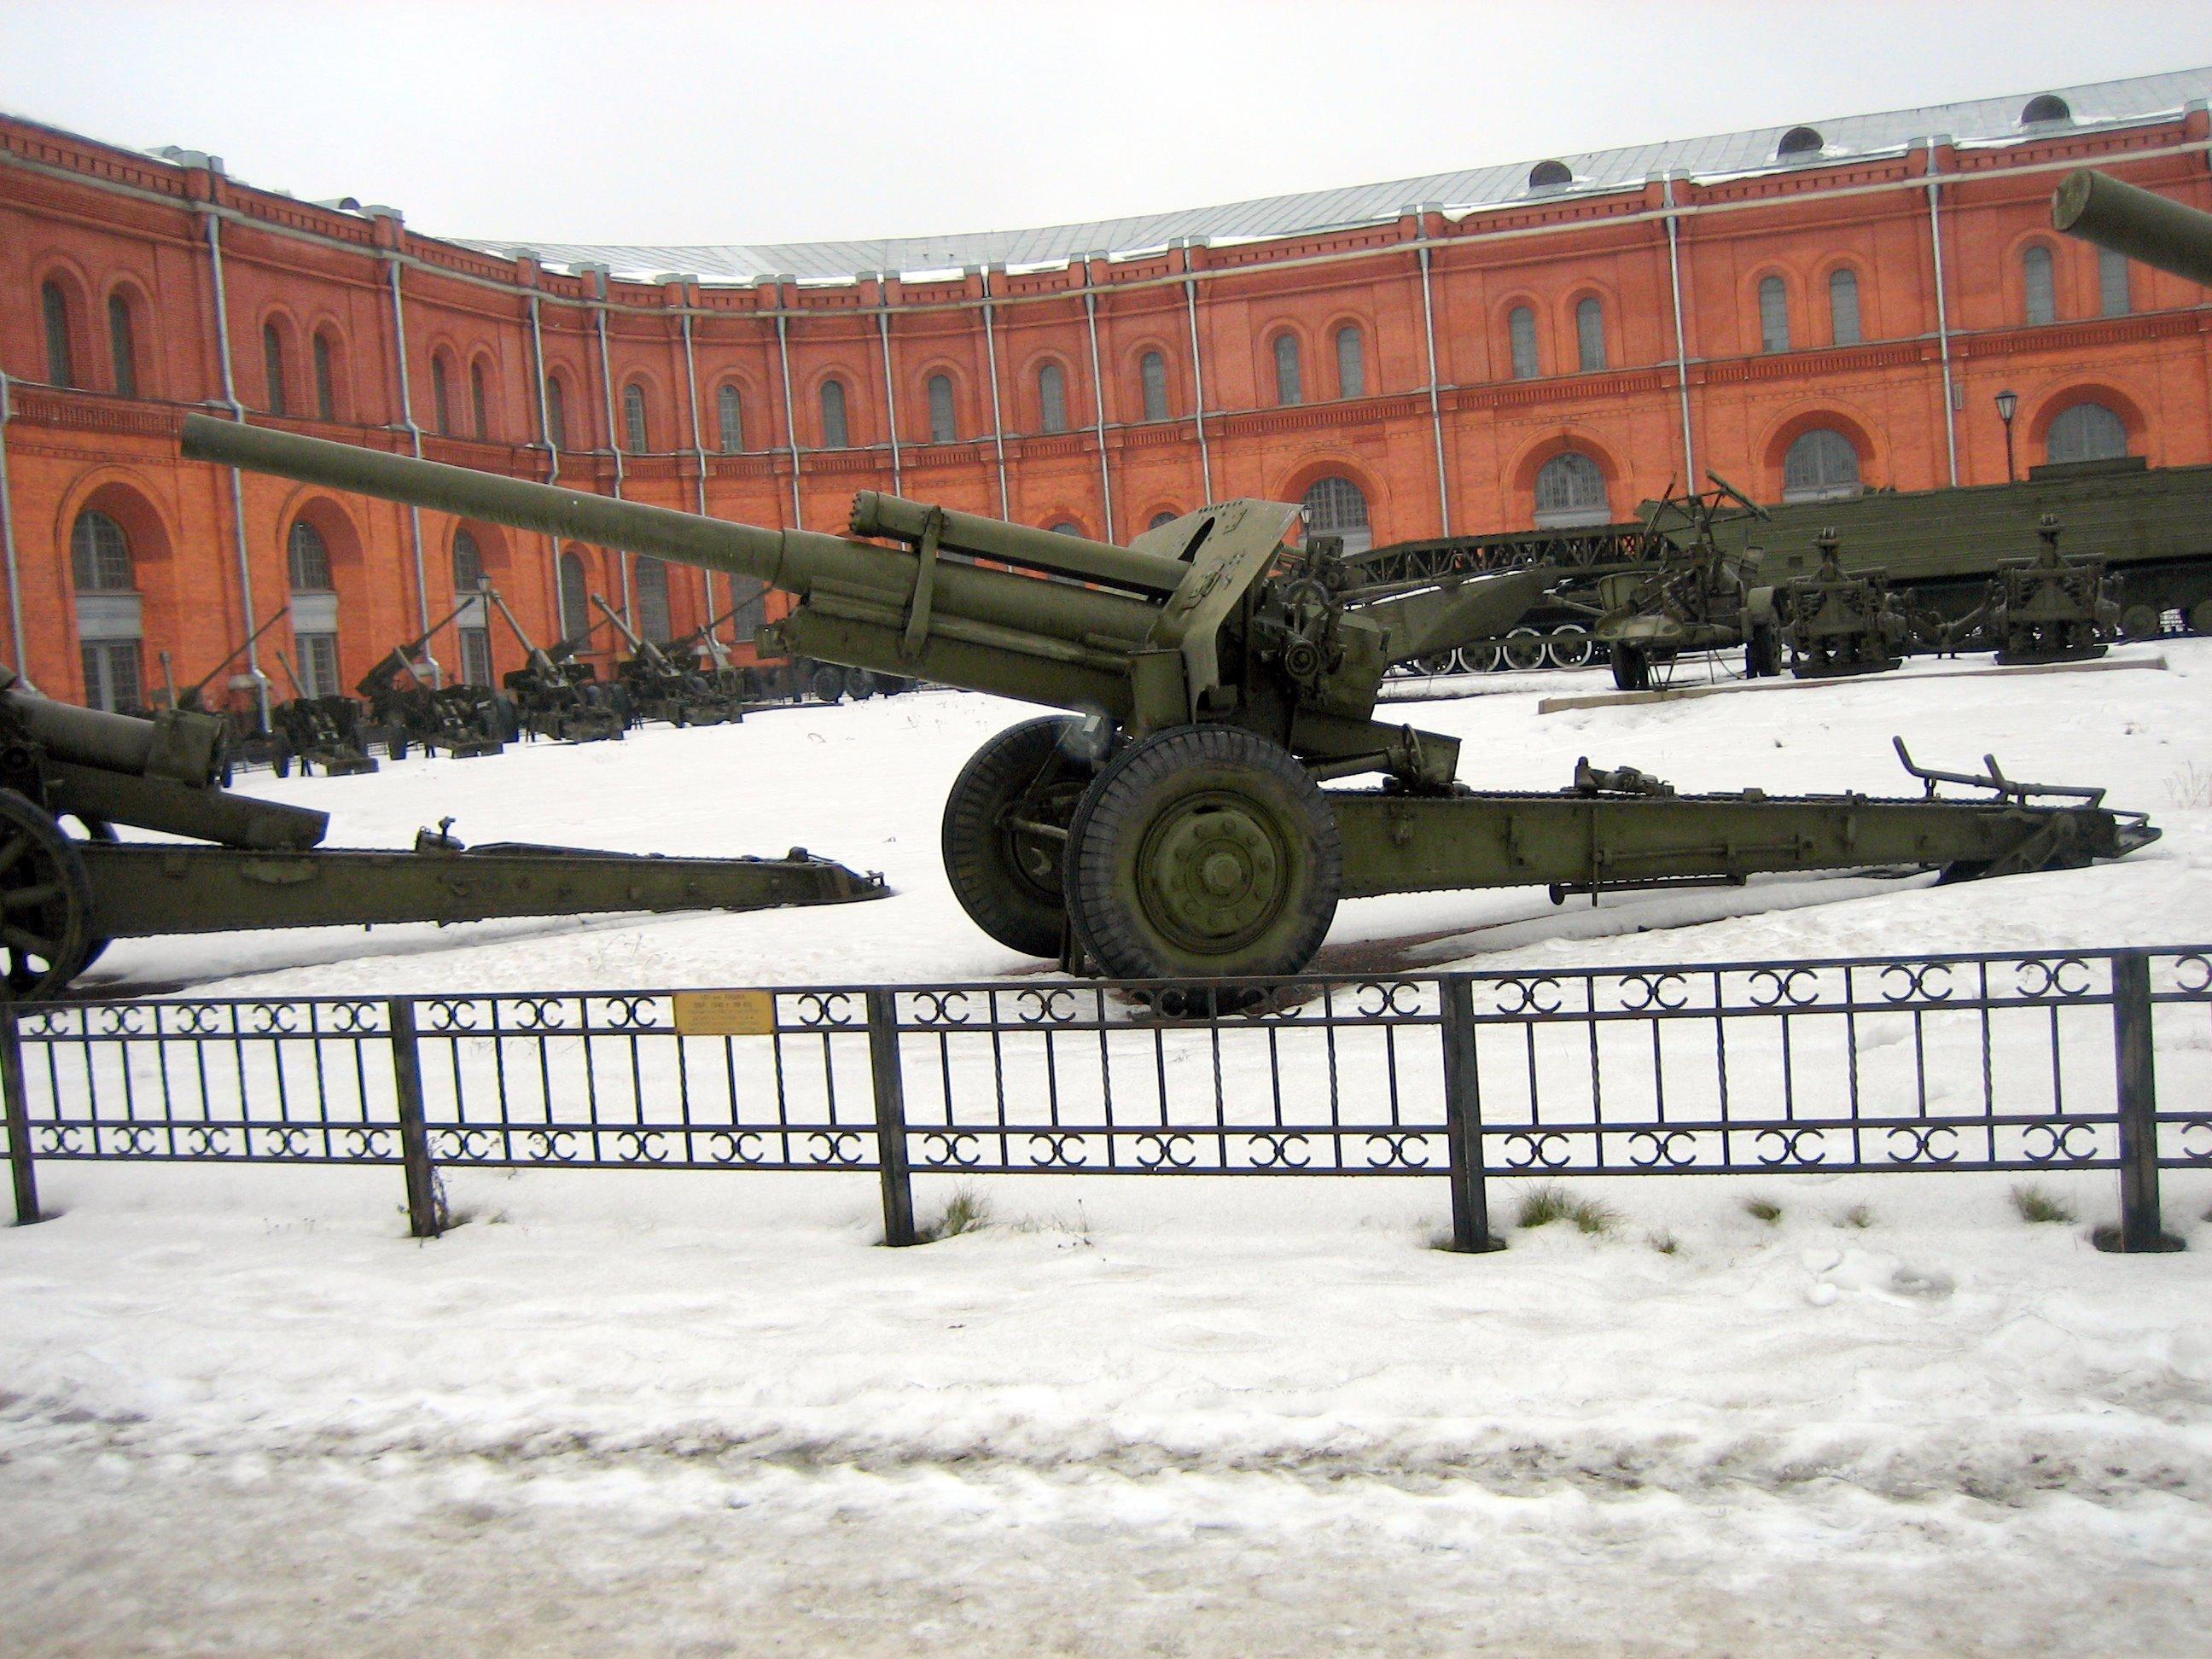 Cañones soviéticos de la Segunda Guerra Mundial M60_Saint_Petersburg_1%D0%B0